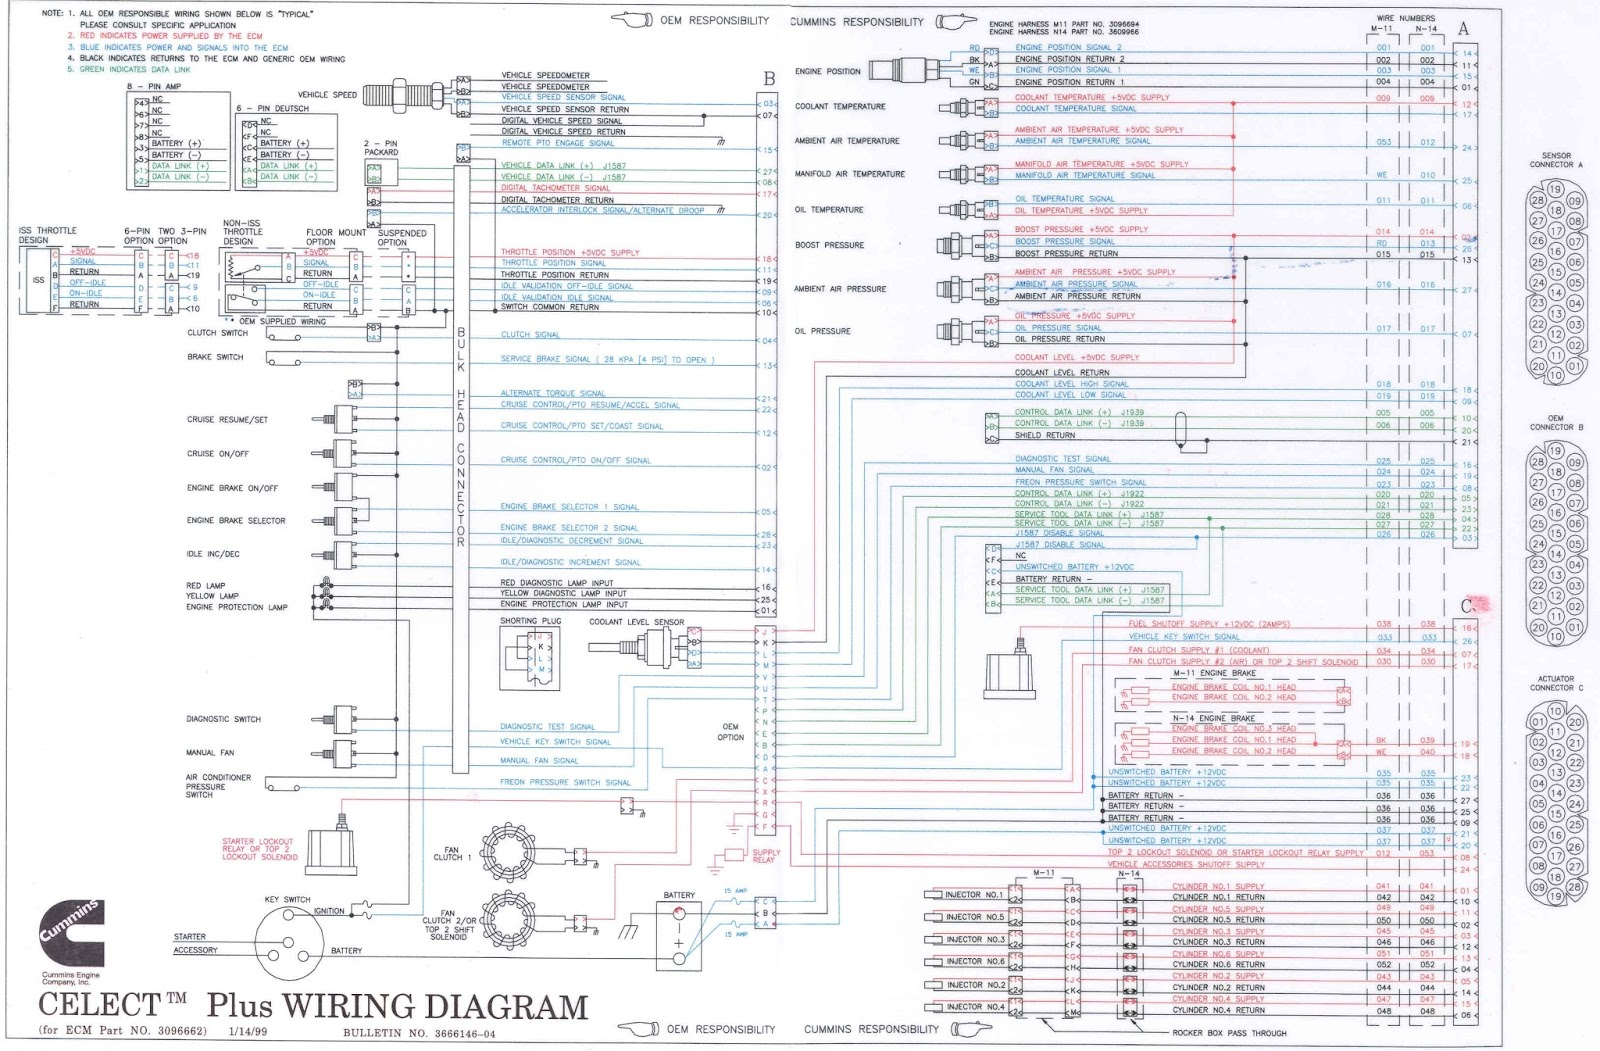 Cummins Celect Plus Wiring Diagram N14: N14 Celect Plus Wiring Diagram. N14  Cummins Celect